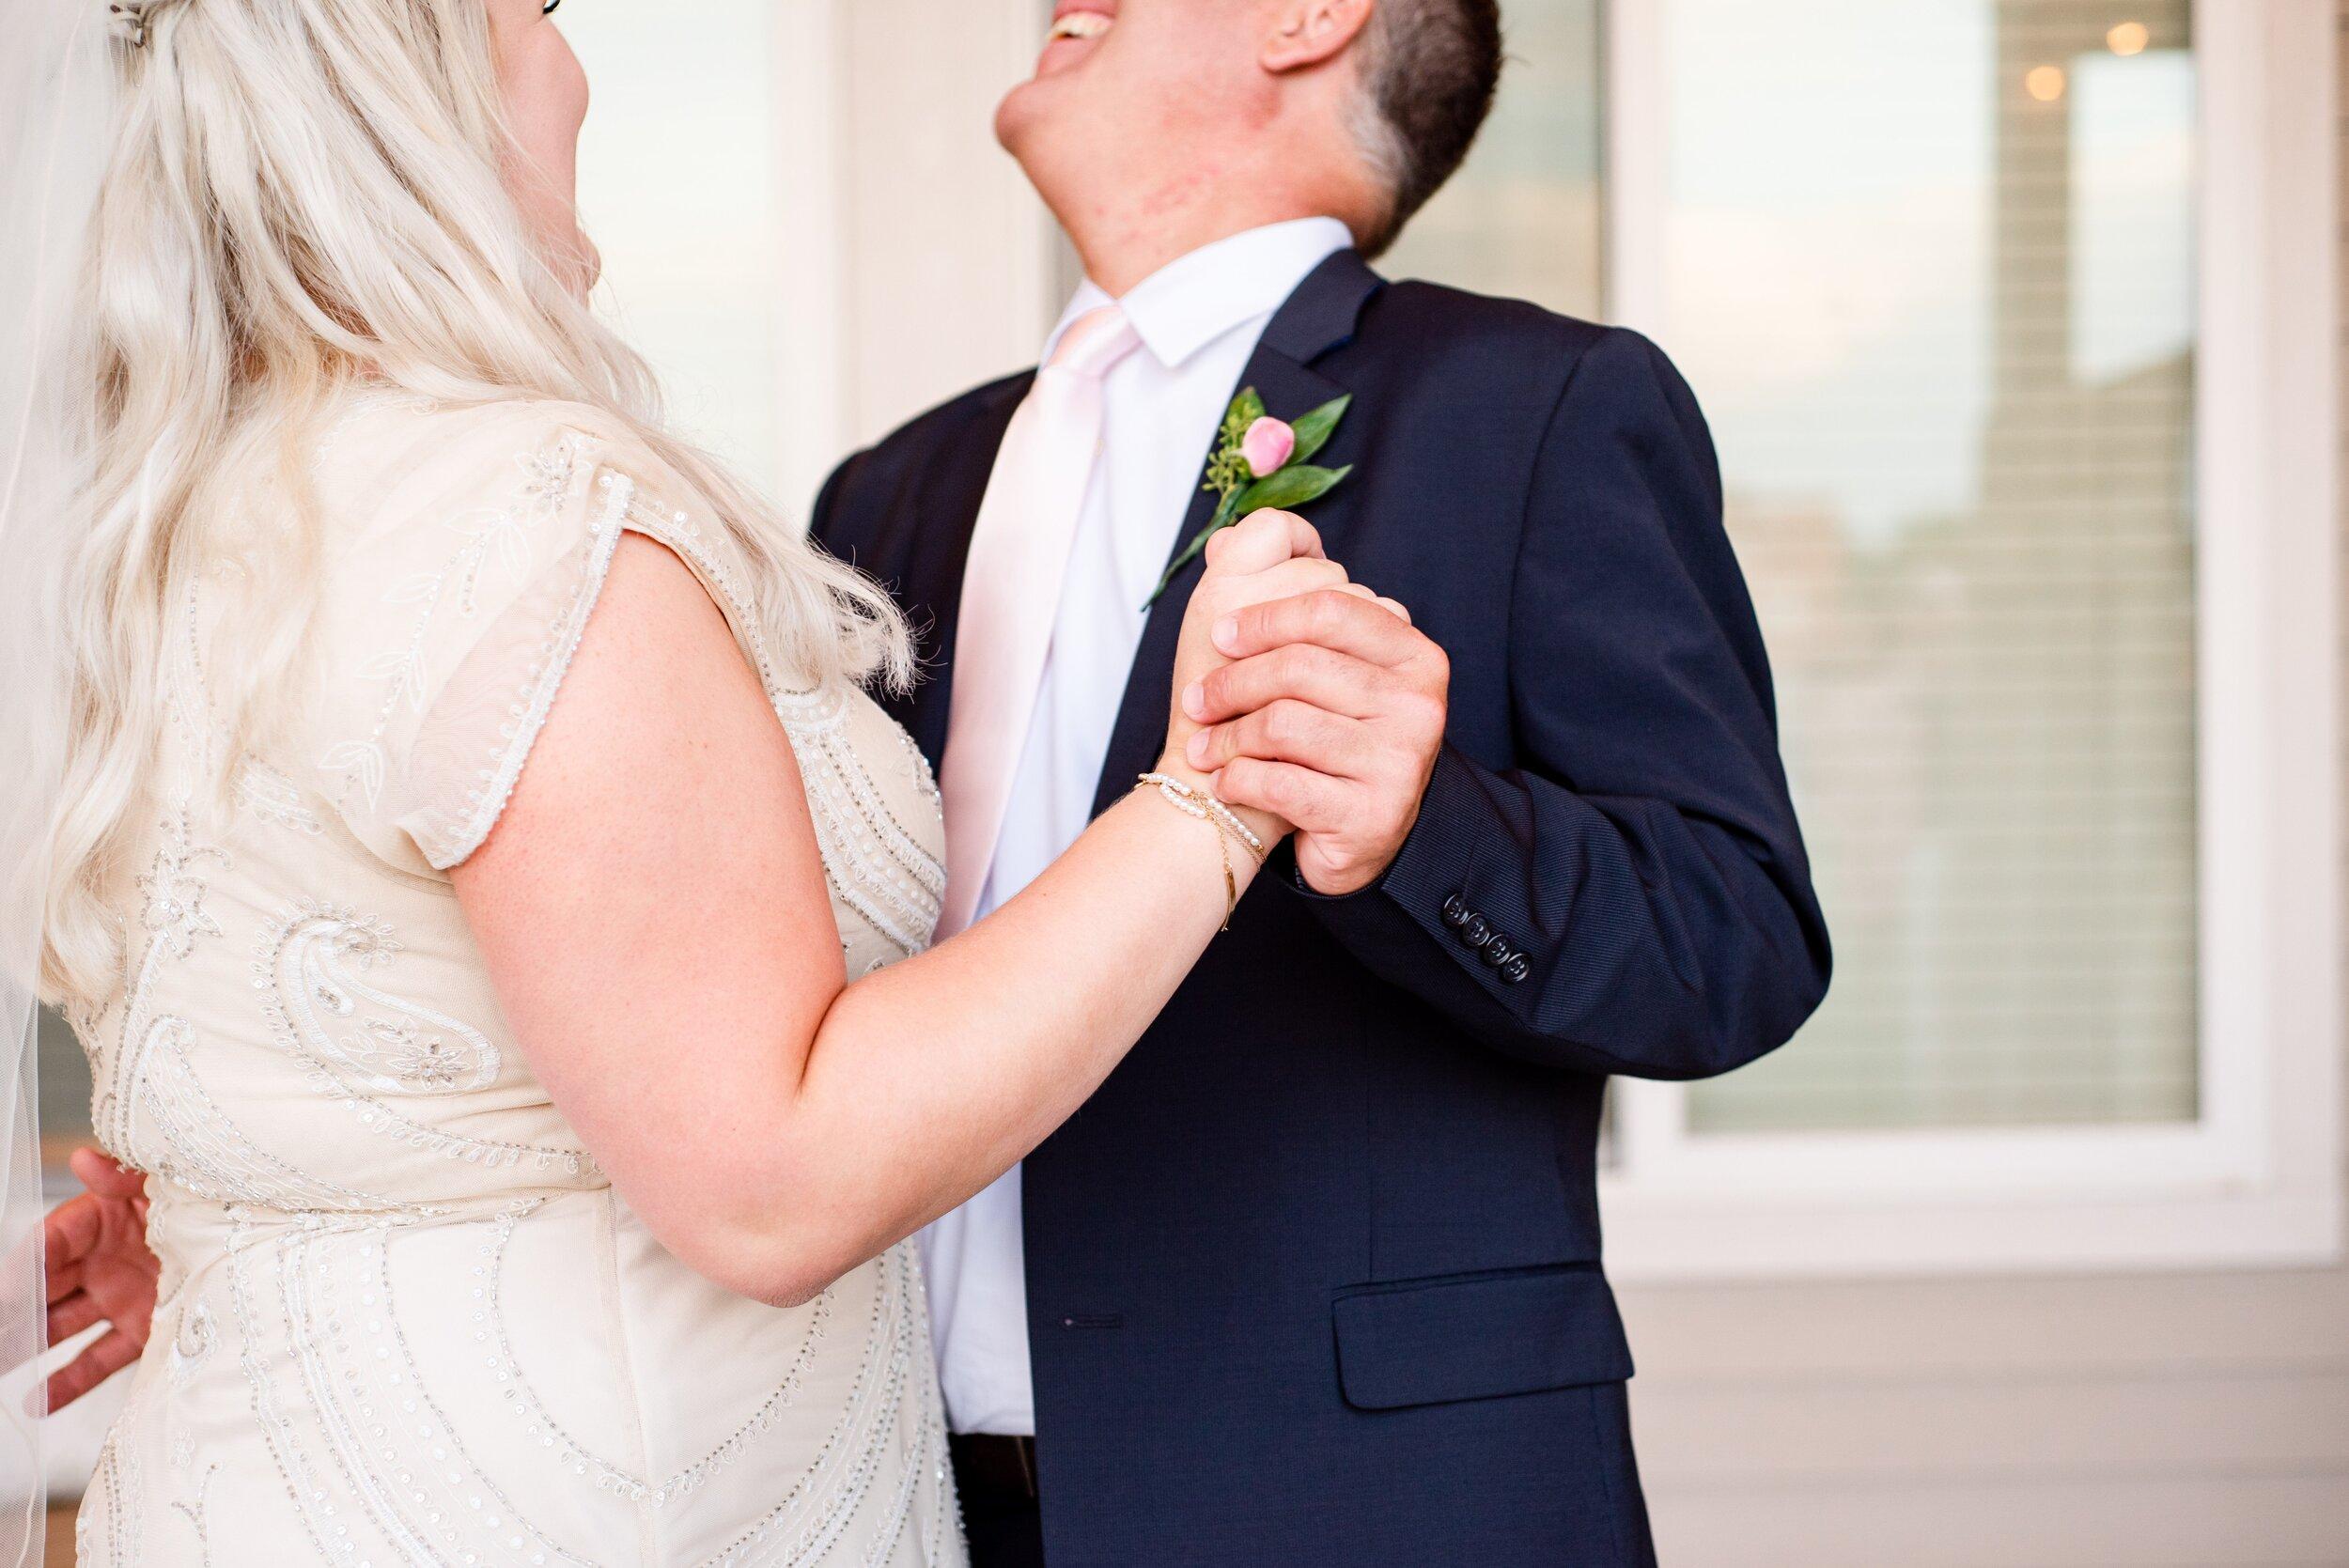 Daddy Daughter Dance - Tri Cities Wedding Photographer - Morgan Tayler Photo & Design - Tri Cities Washington Backyard Wedding